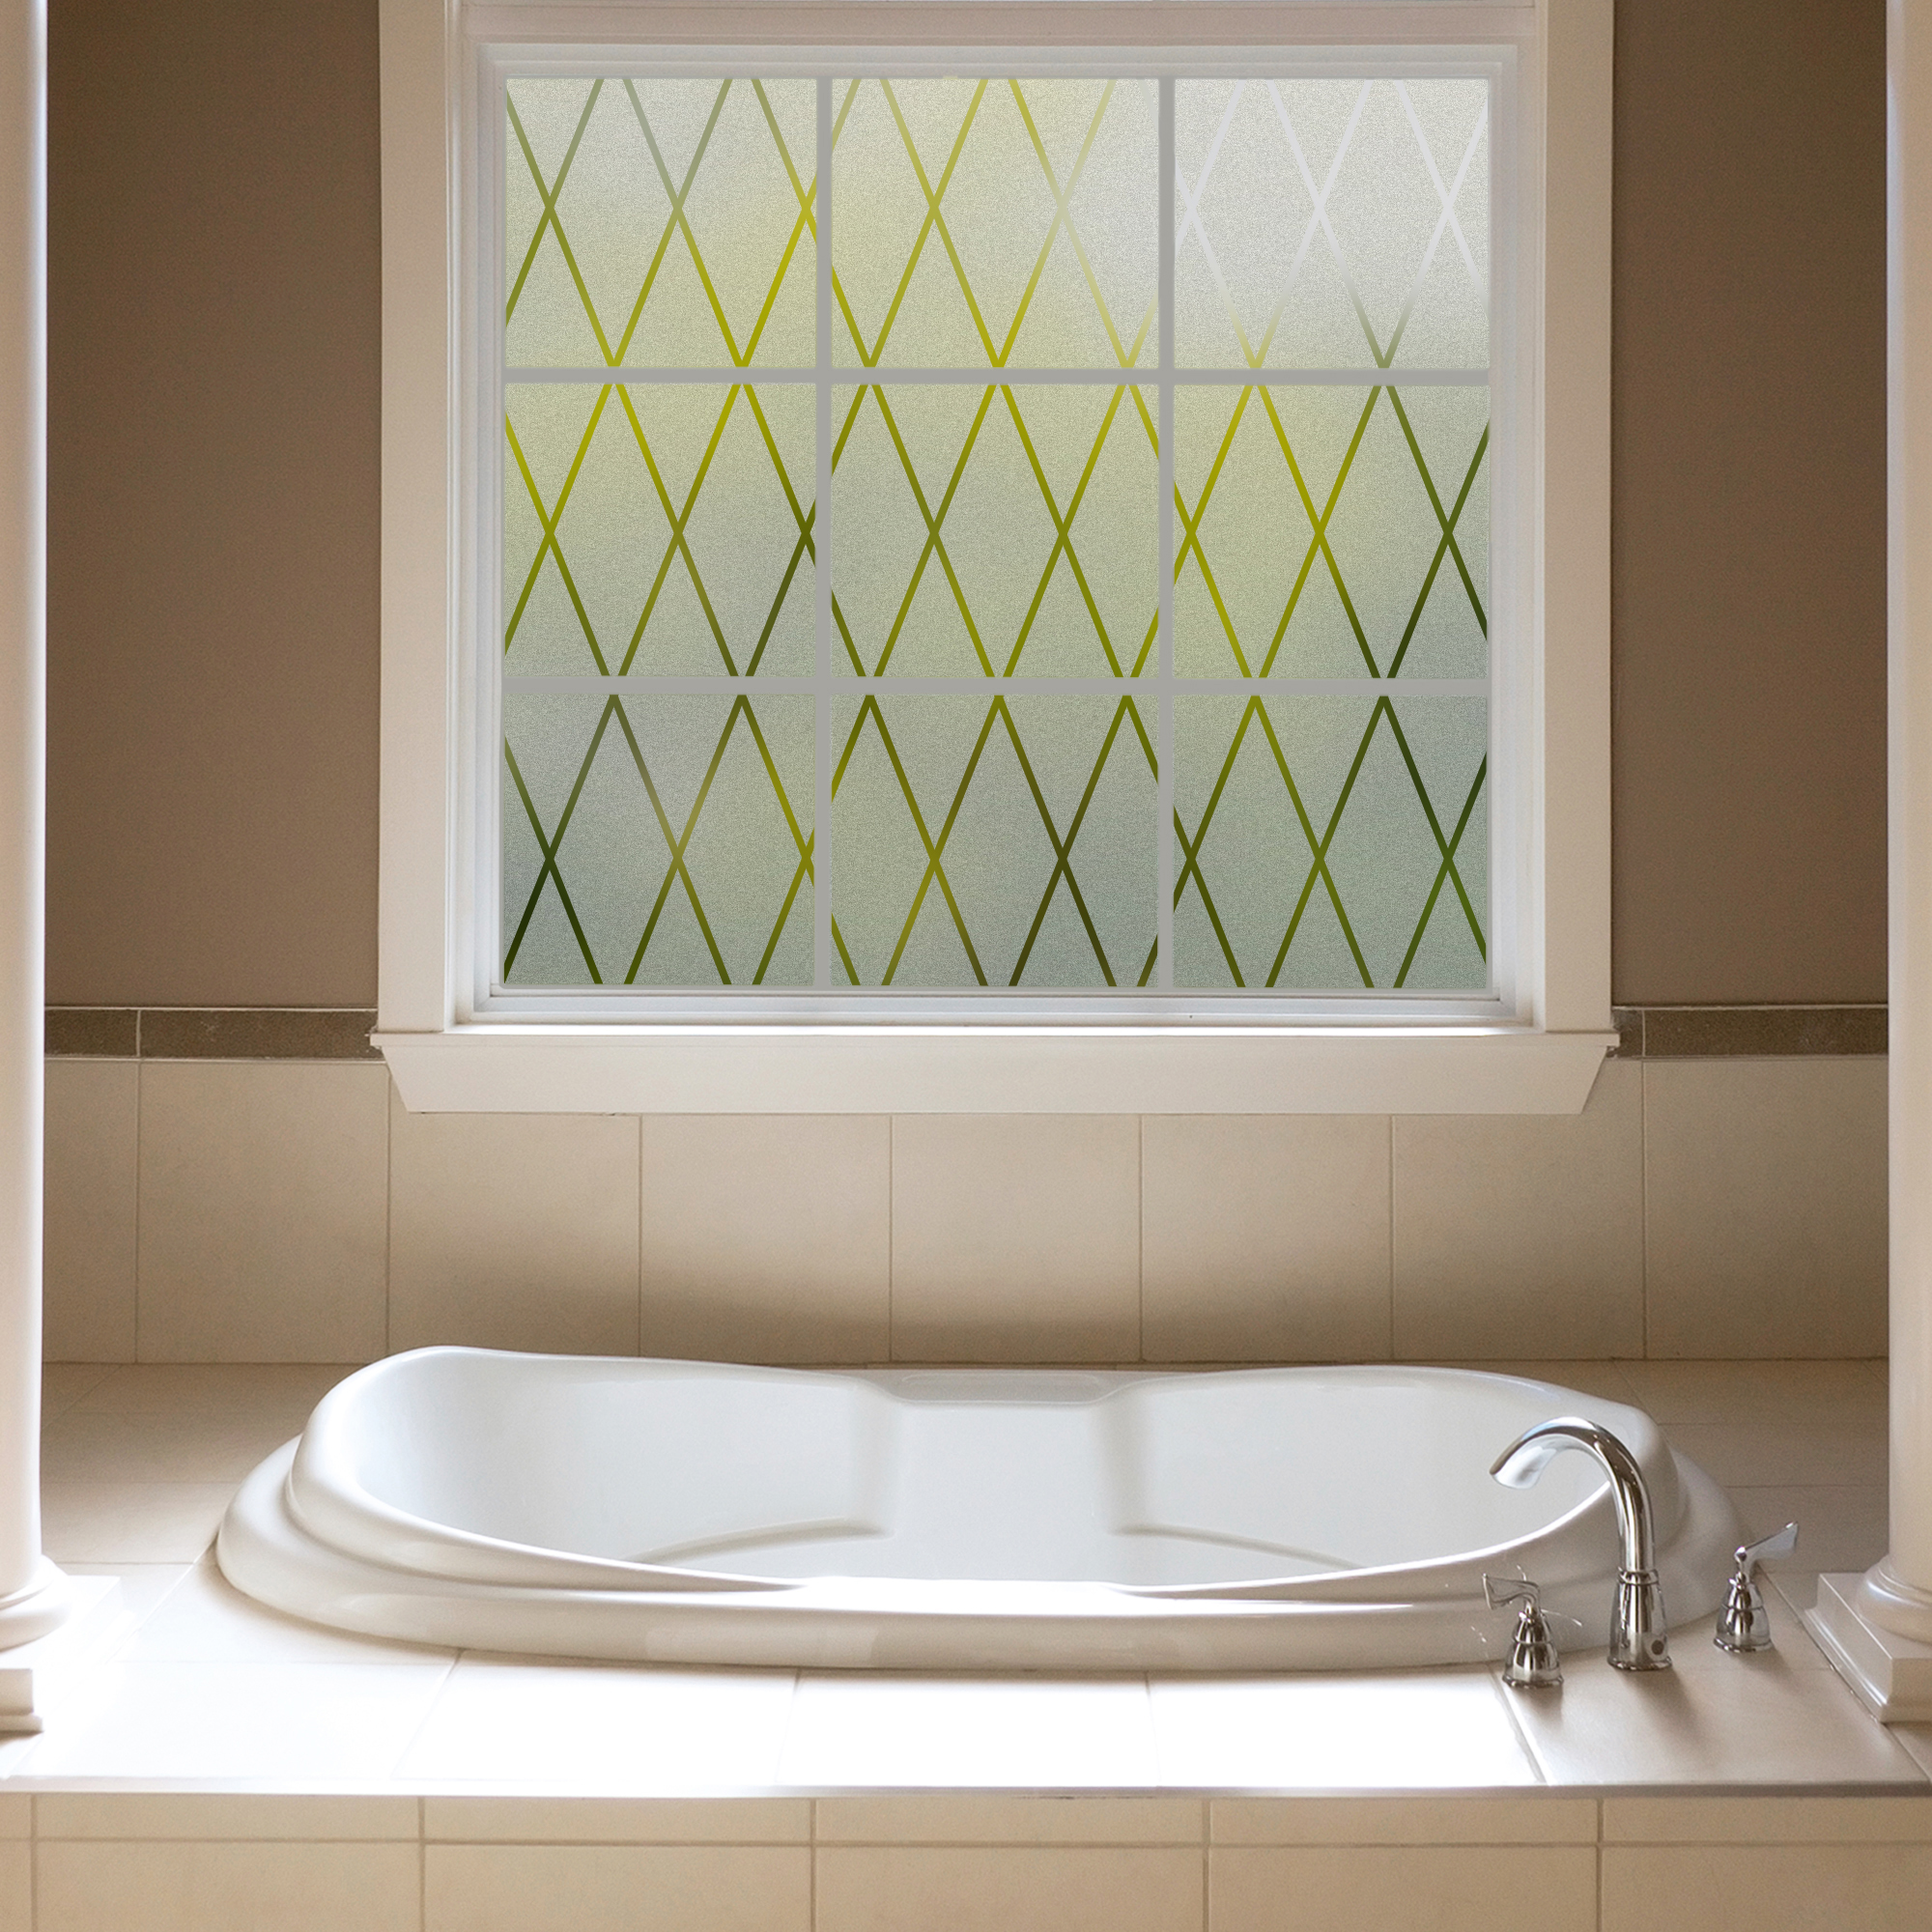 Gila Frosted Lattice Privacy Control Dcor Window Film